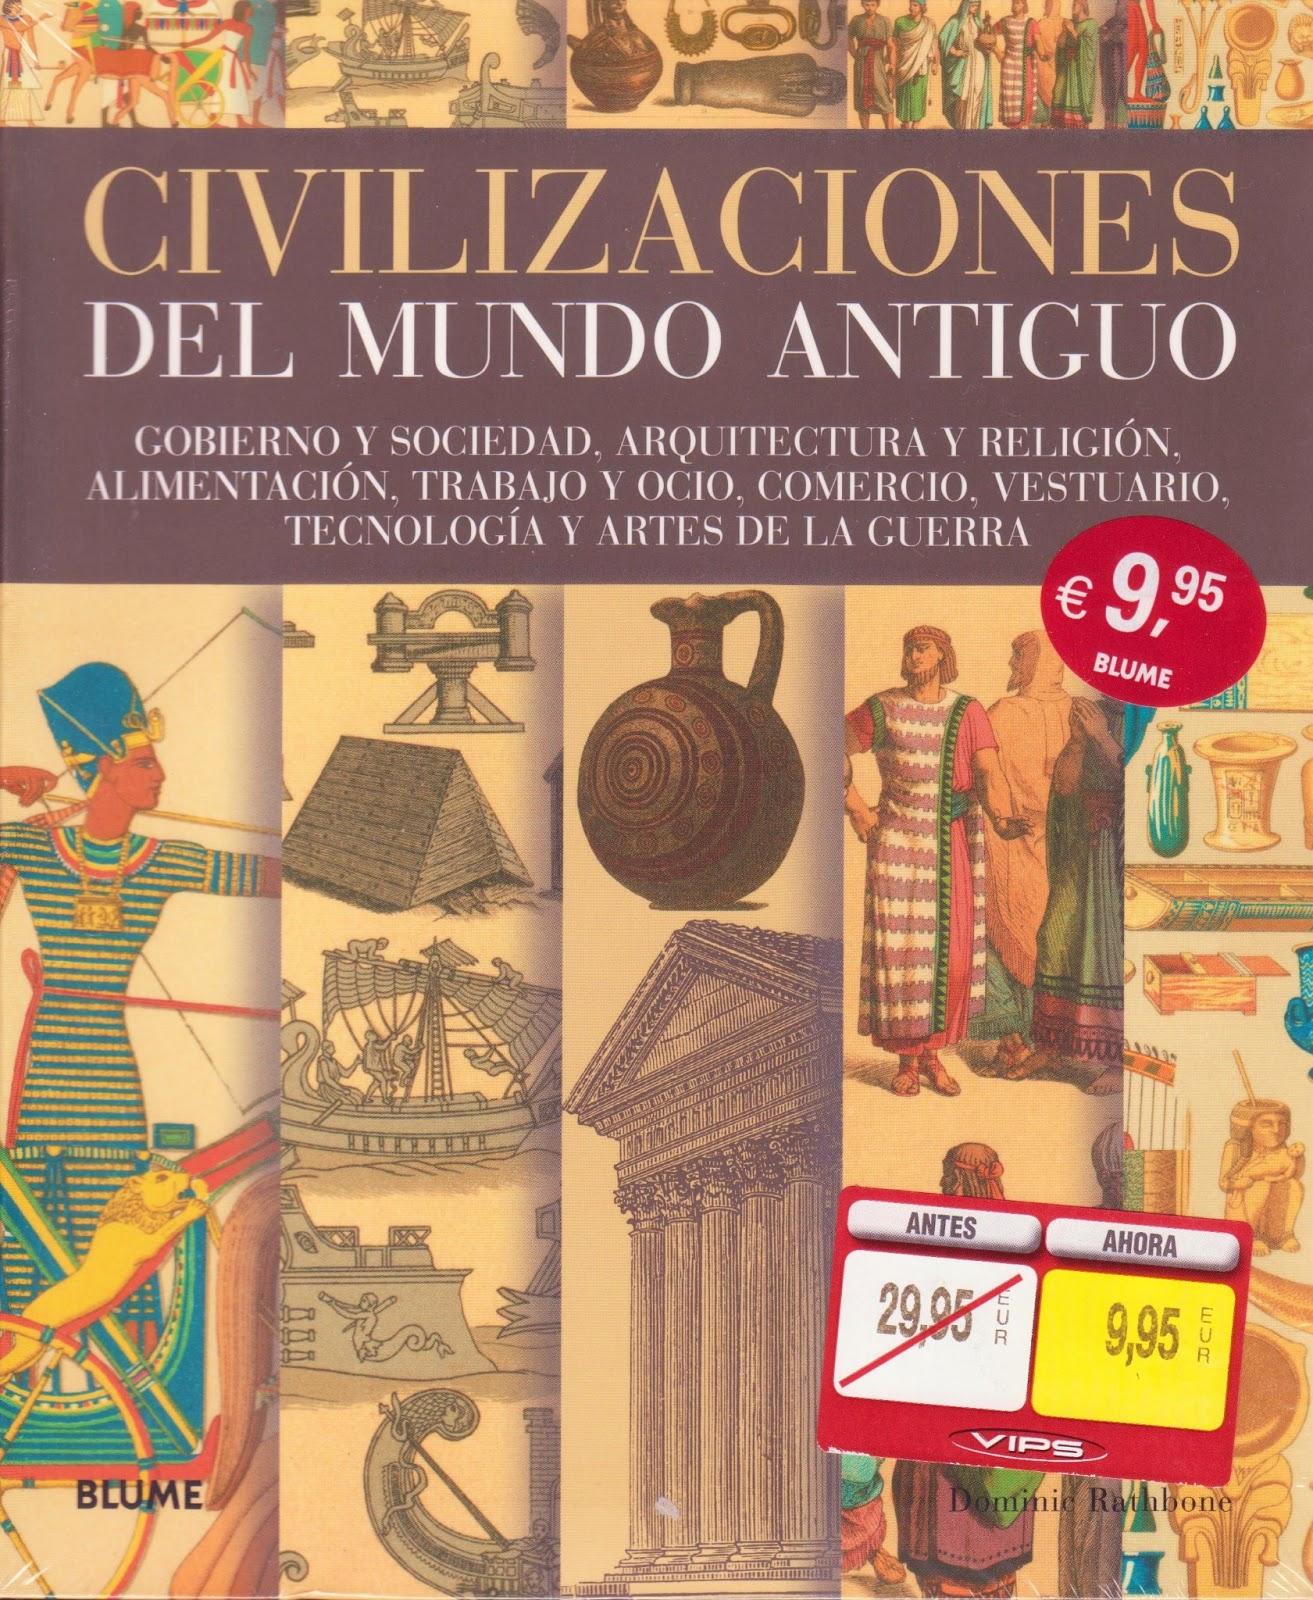 Historia mundo antiguo y civilizaciones for Arquitectura del mundo antiguo